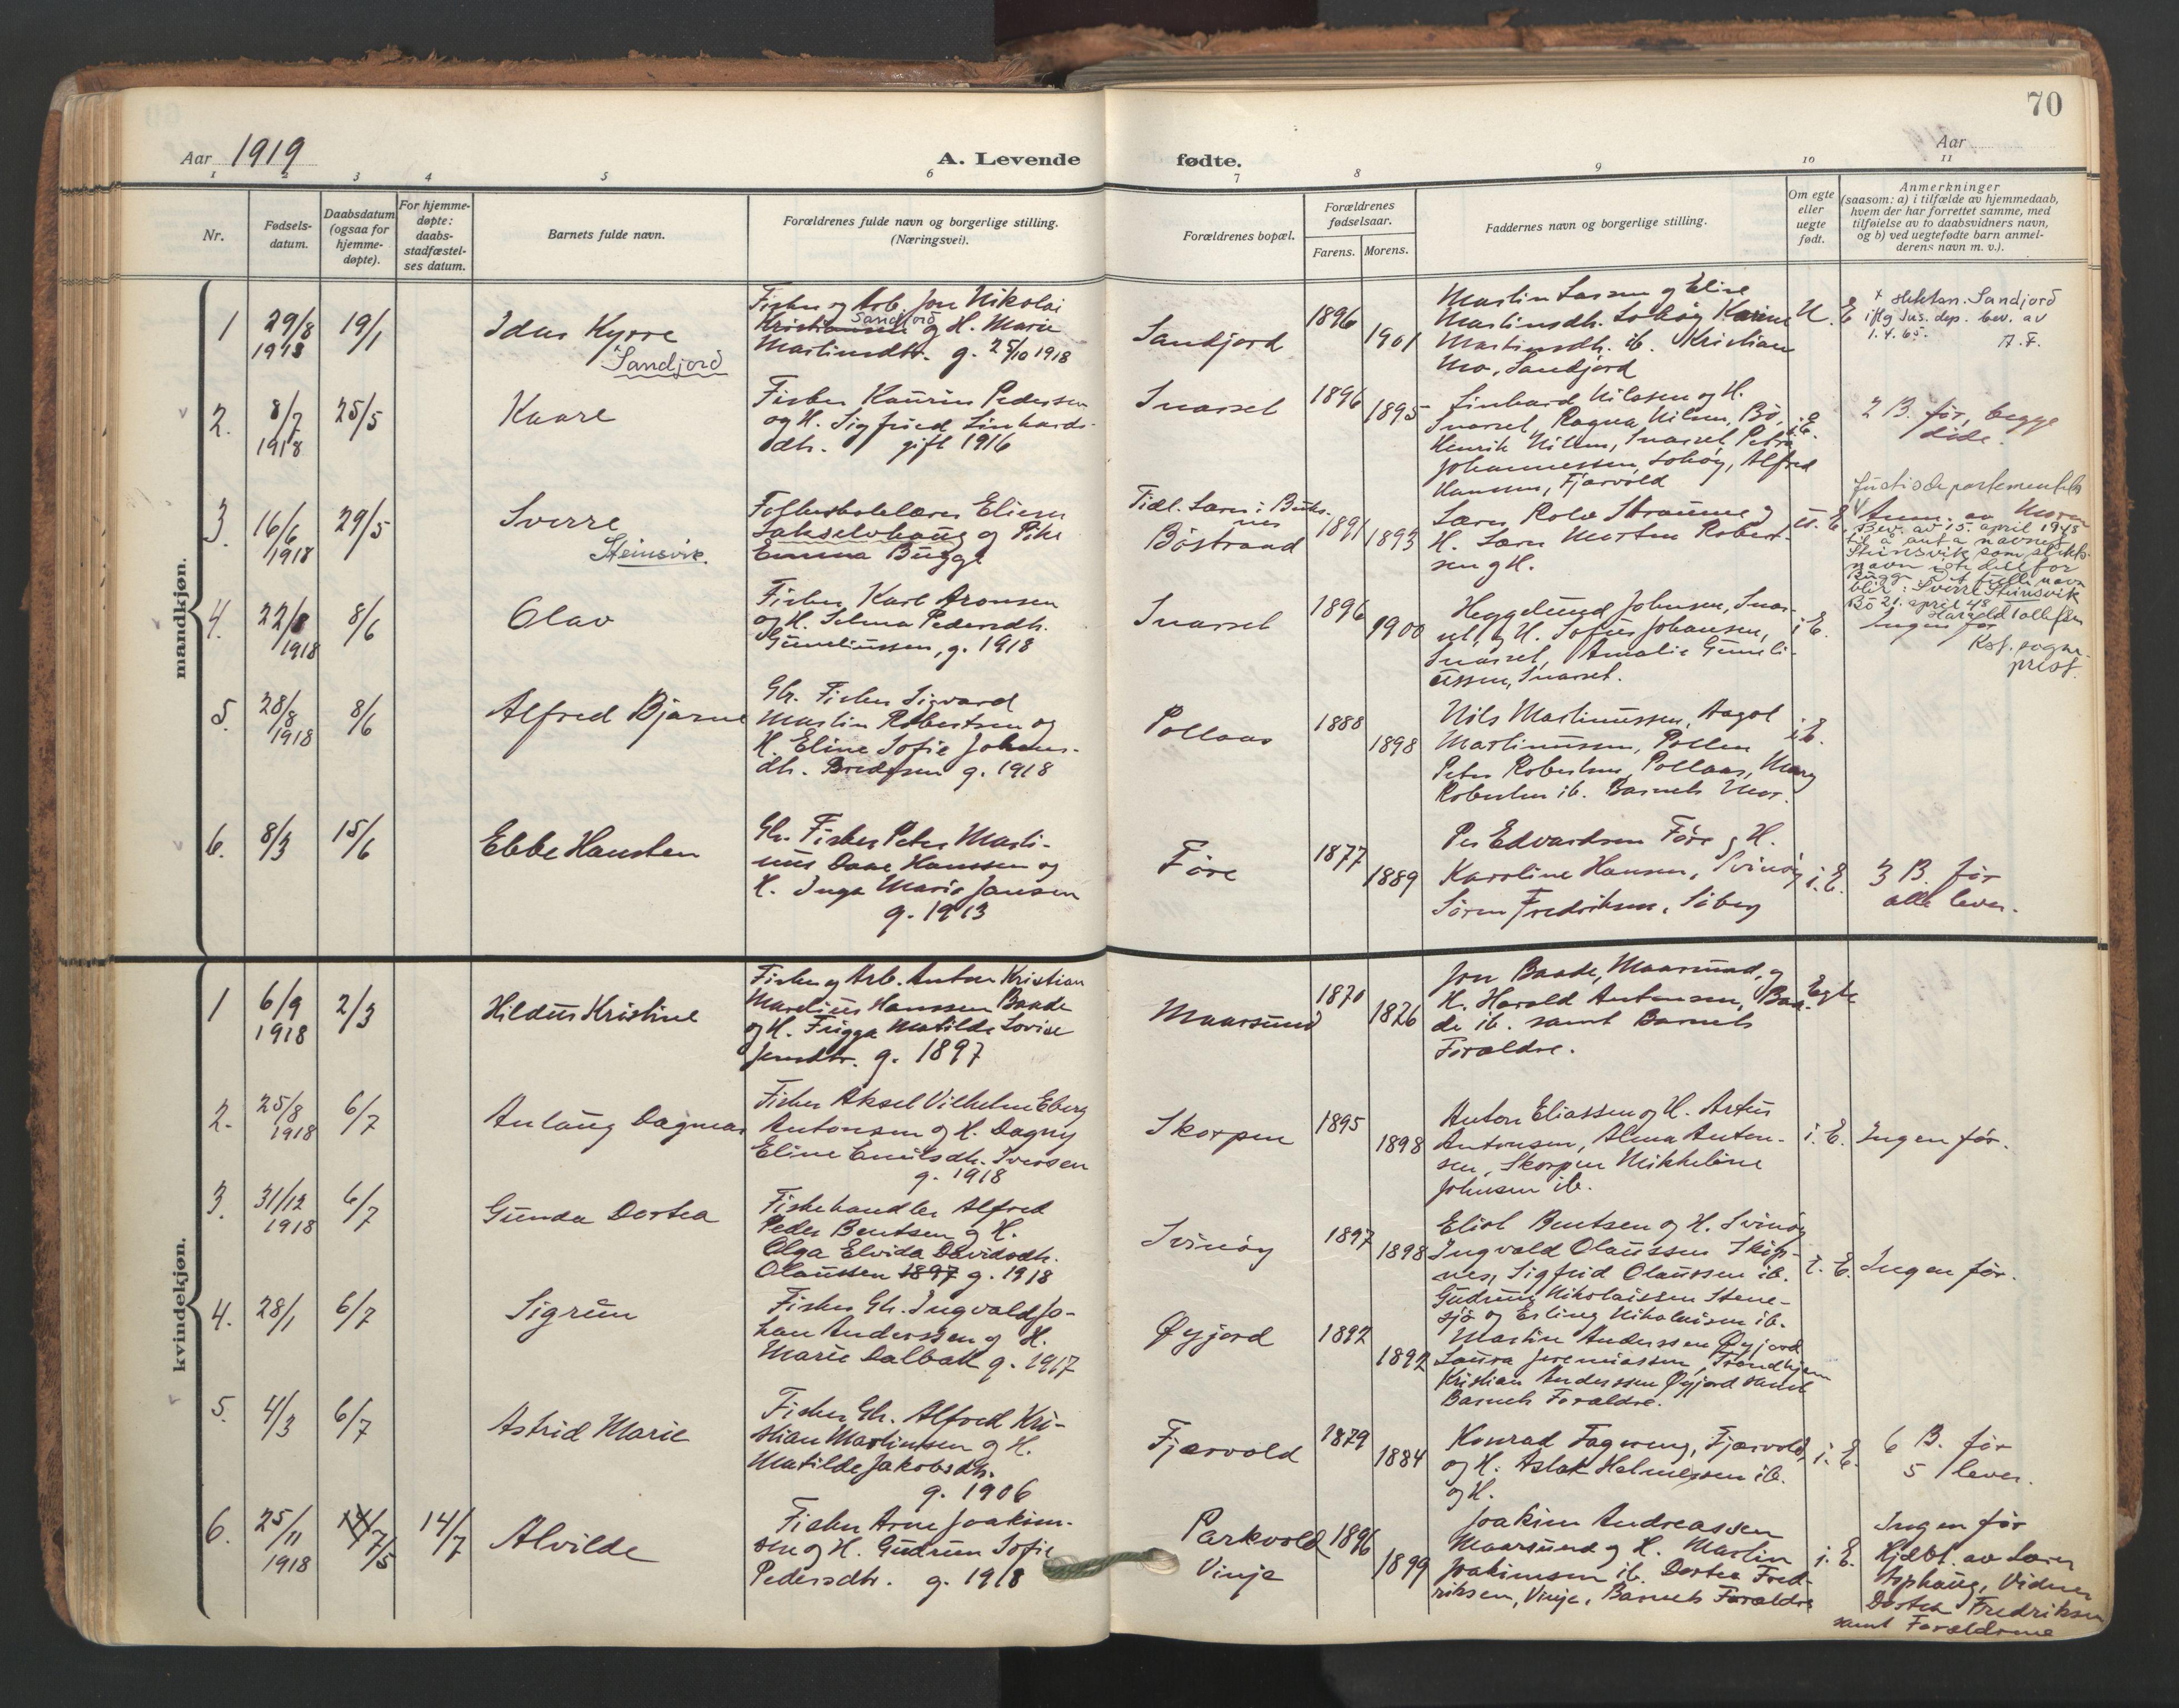 SAT, Ministerialprotokoller, klokkerbøker og fødselsregistre - Nordland, 891/L1306: Ministerialbok nr. 891A11, 1911-1927, s. 70